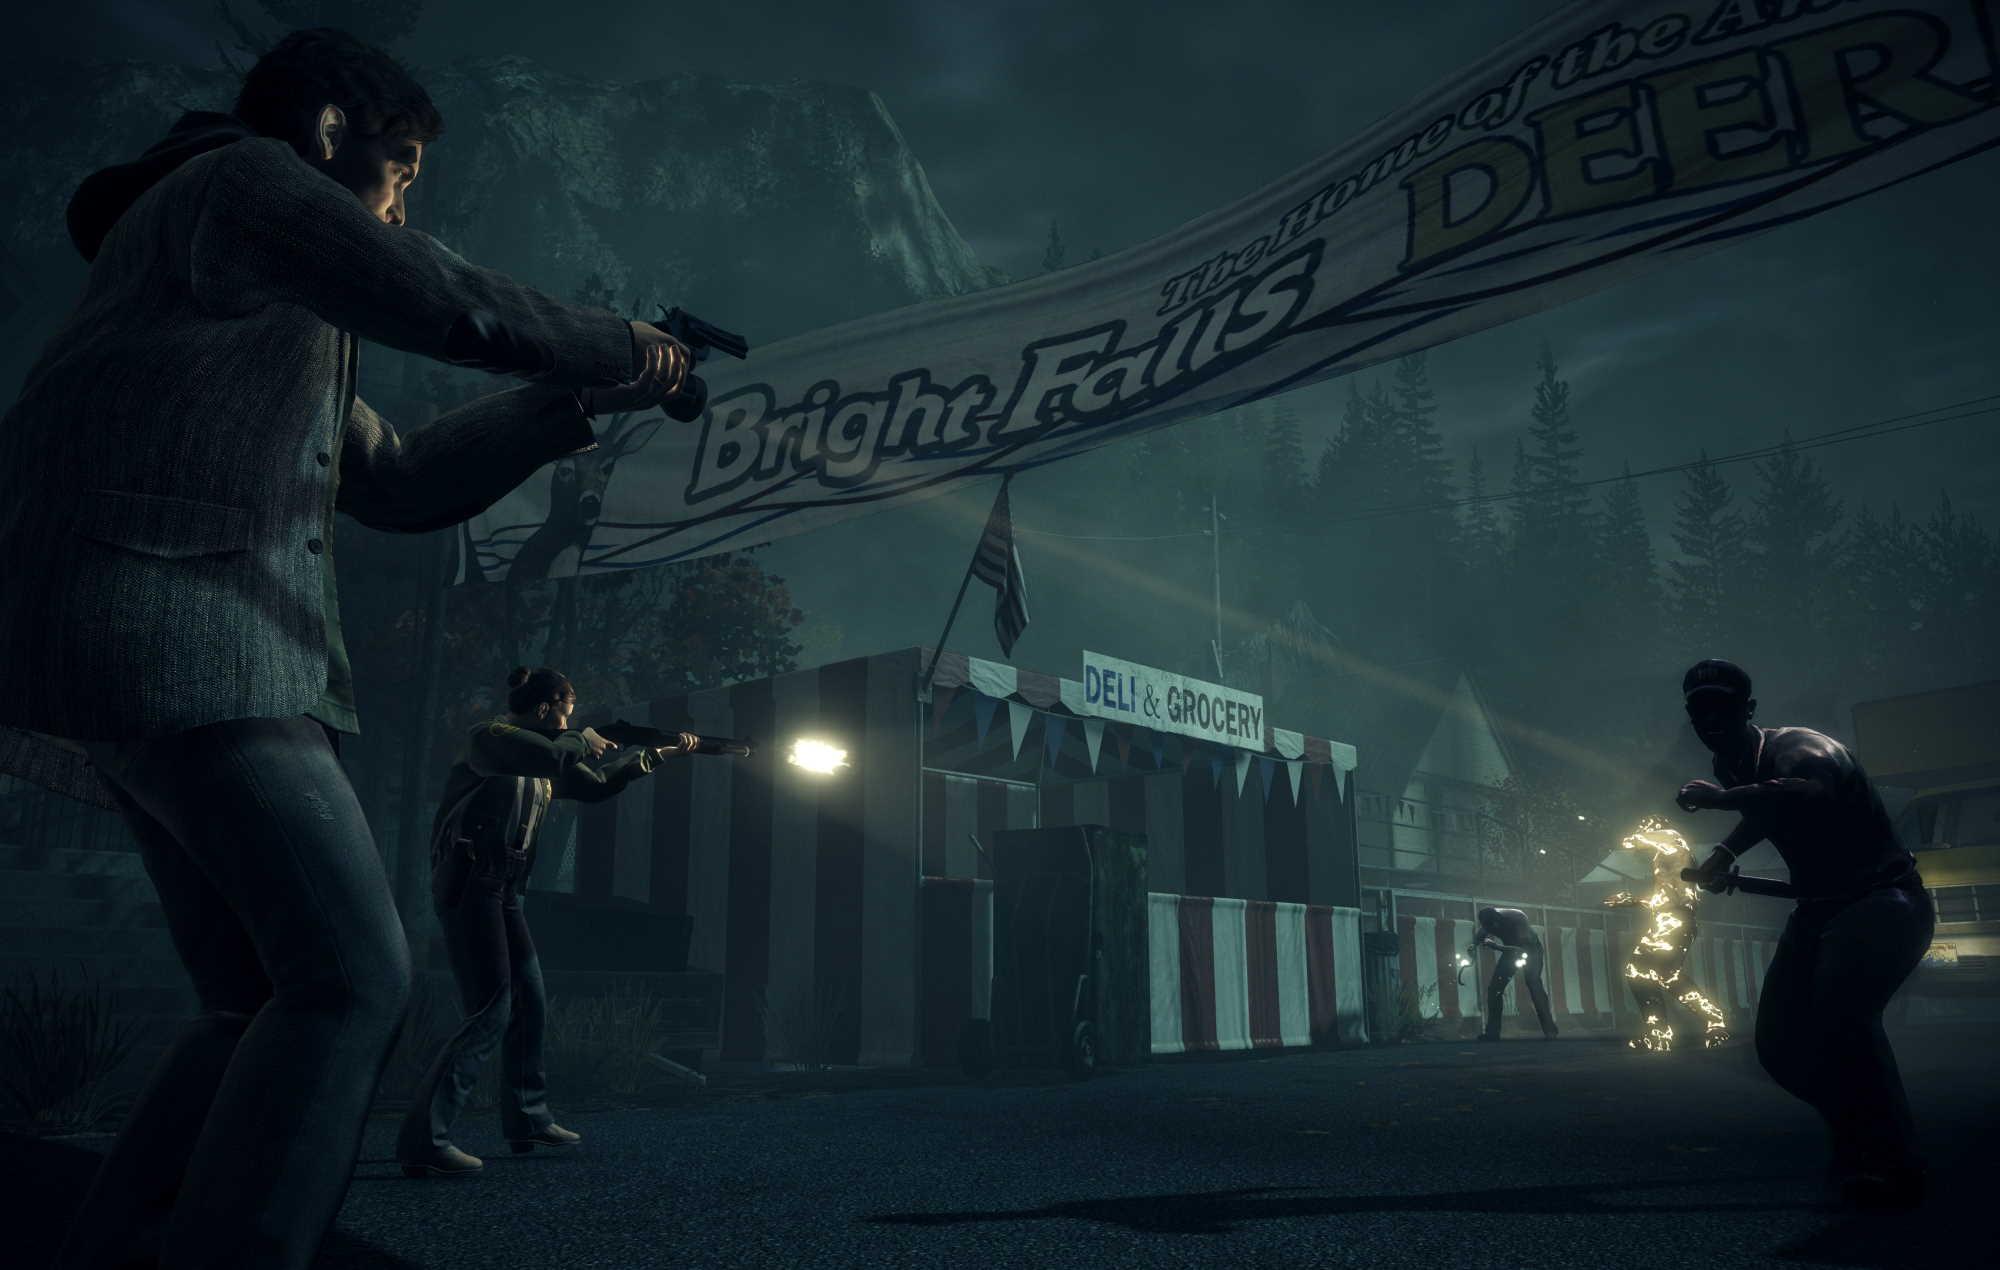 Alan Wake Remastered - Deerfest shootout